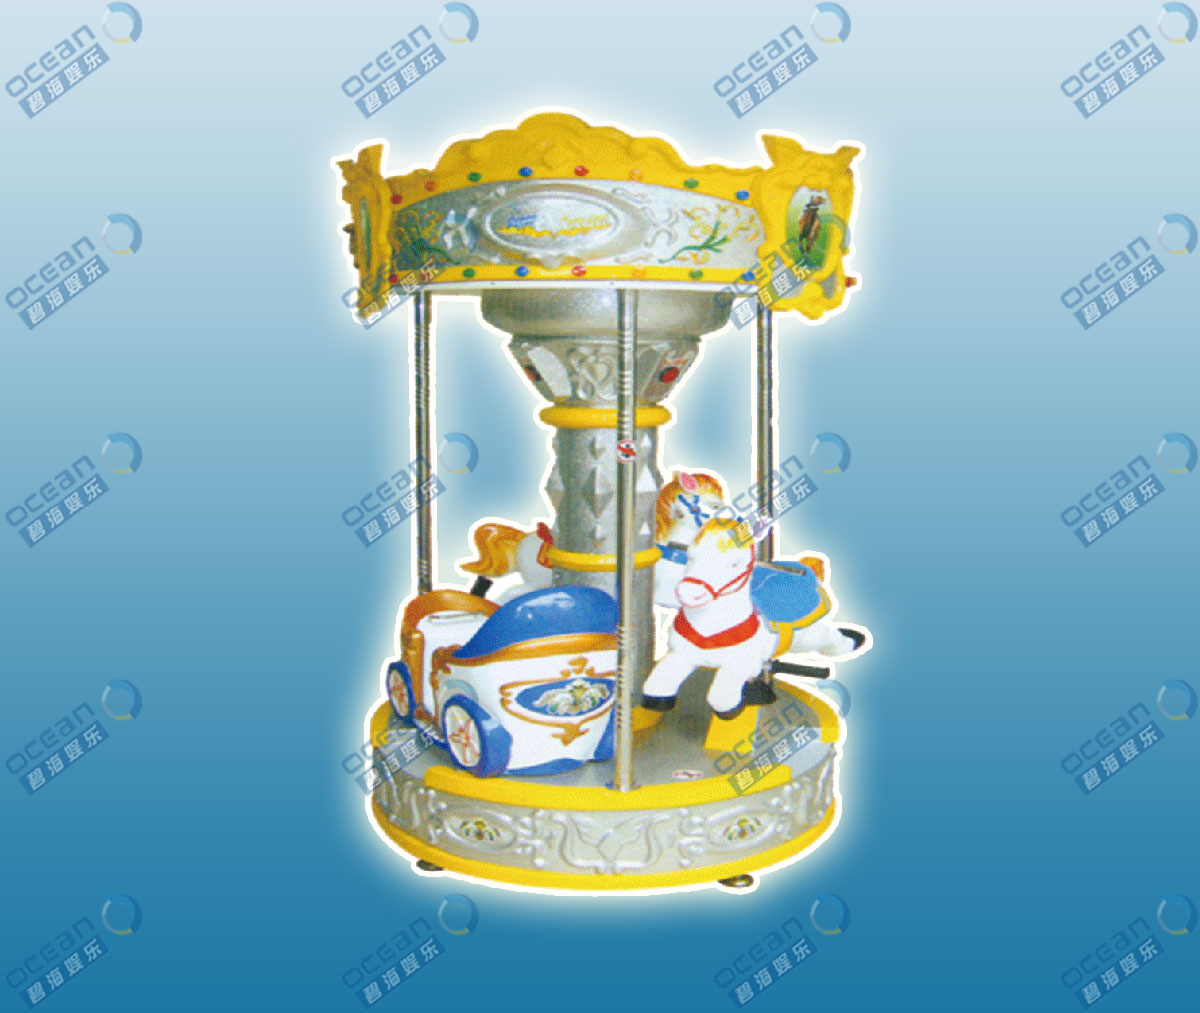 BH802小转马(Little Carousel)